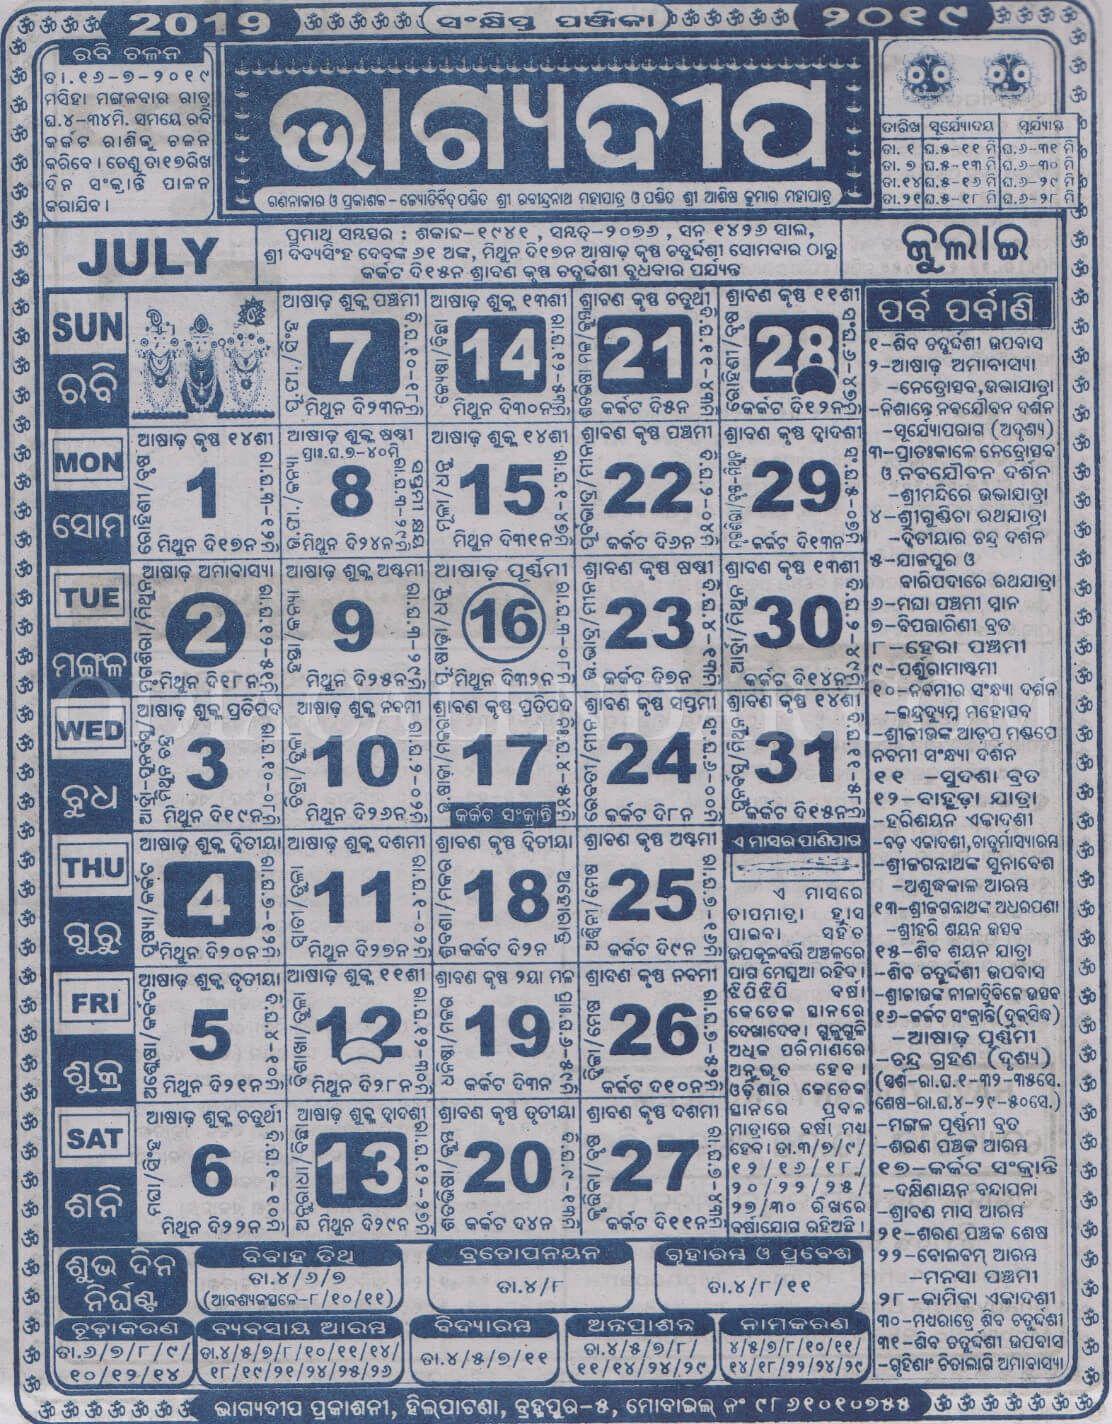 Bhagyadeep Calendar July 2019 | Calendar, Calendar App intended for Odia Calendar Bhagyadeep